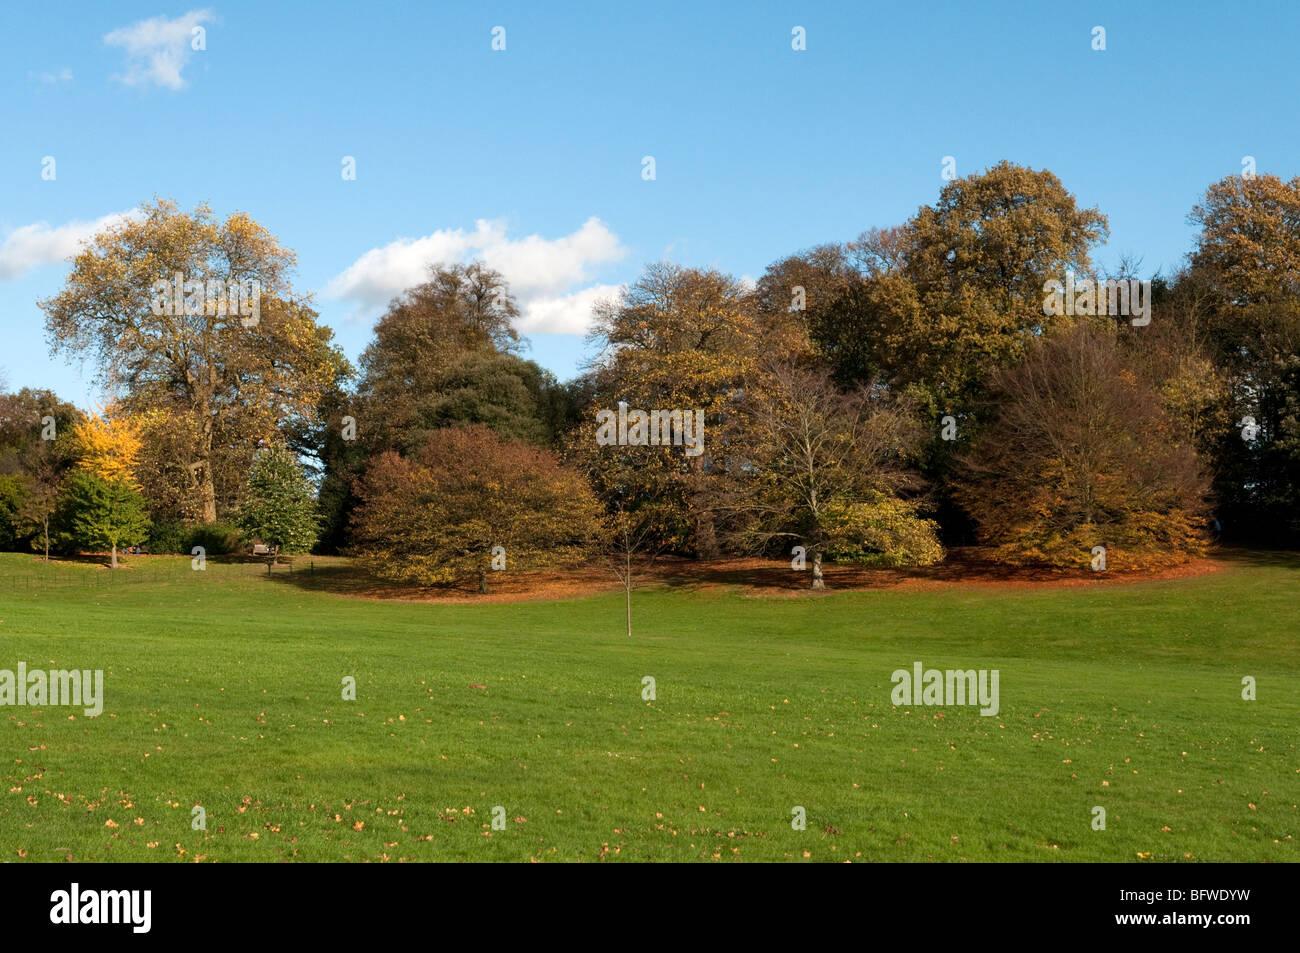 Autumn colours on trees at Kenwood on Hampstead Heath, Highgate, London, UK - Stock Image